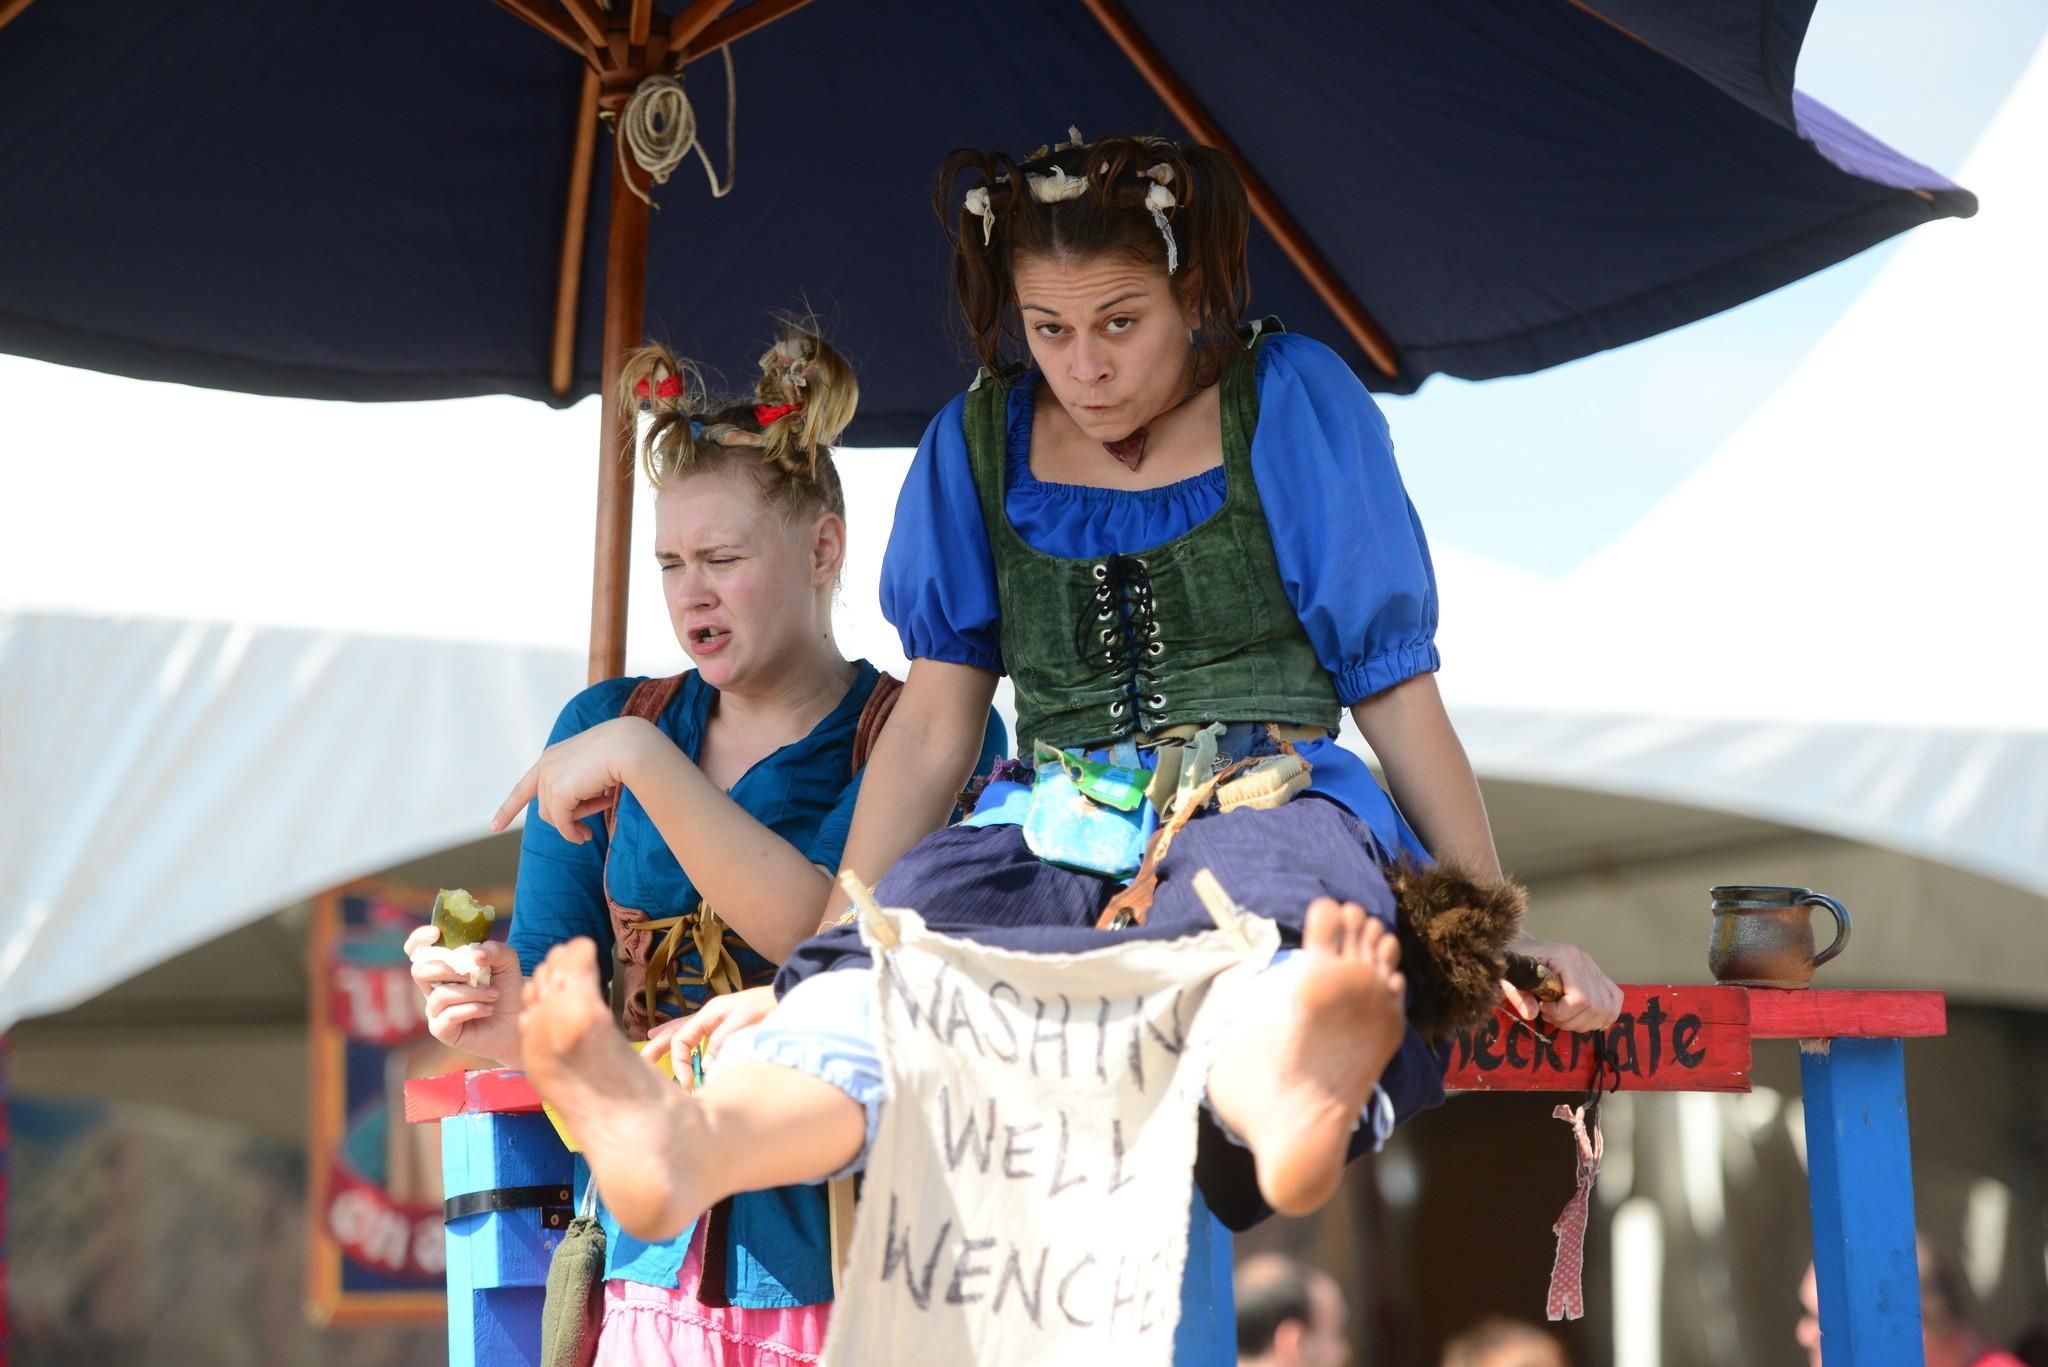 Renaissance Festival photos - Wenches